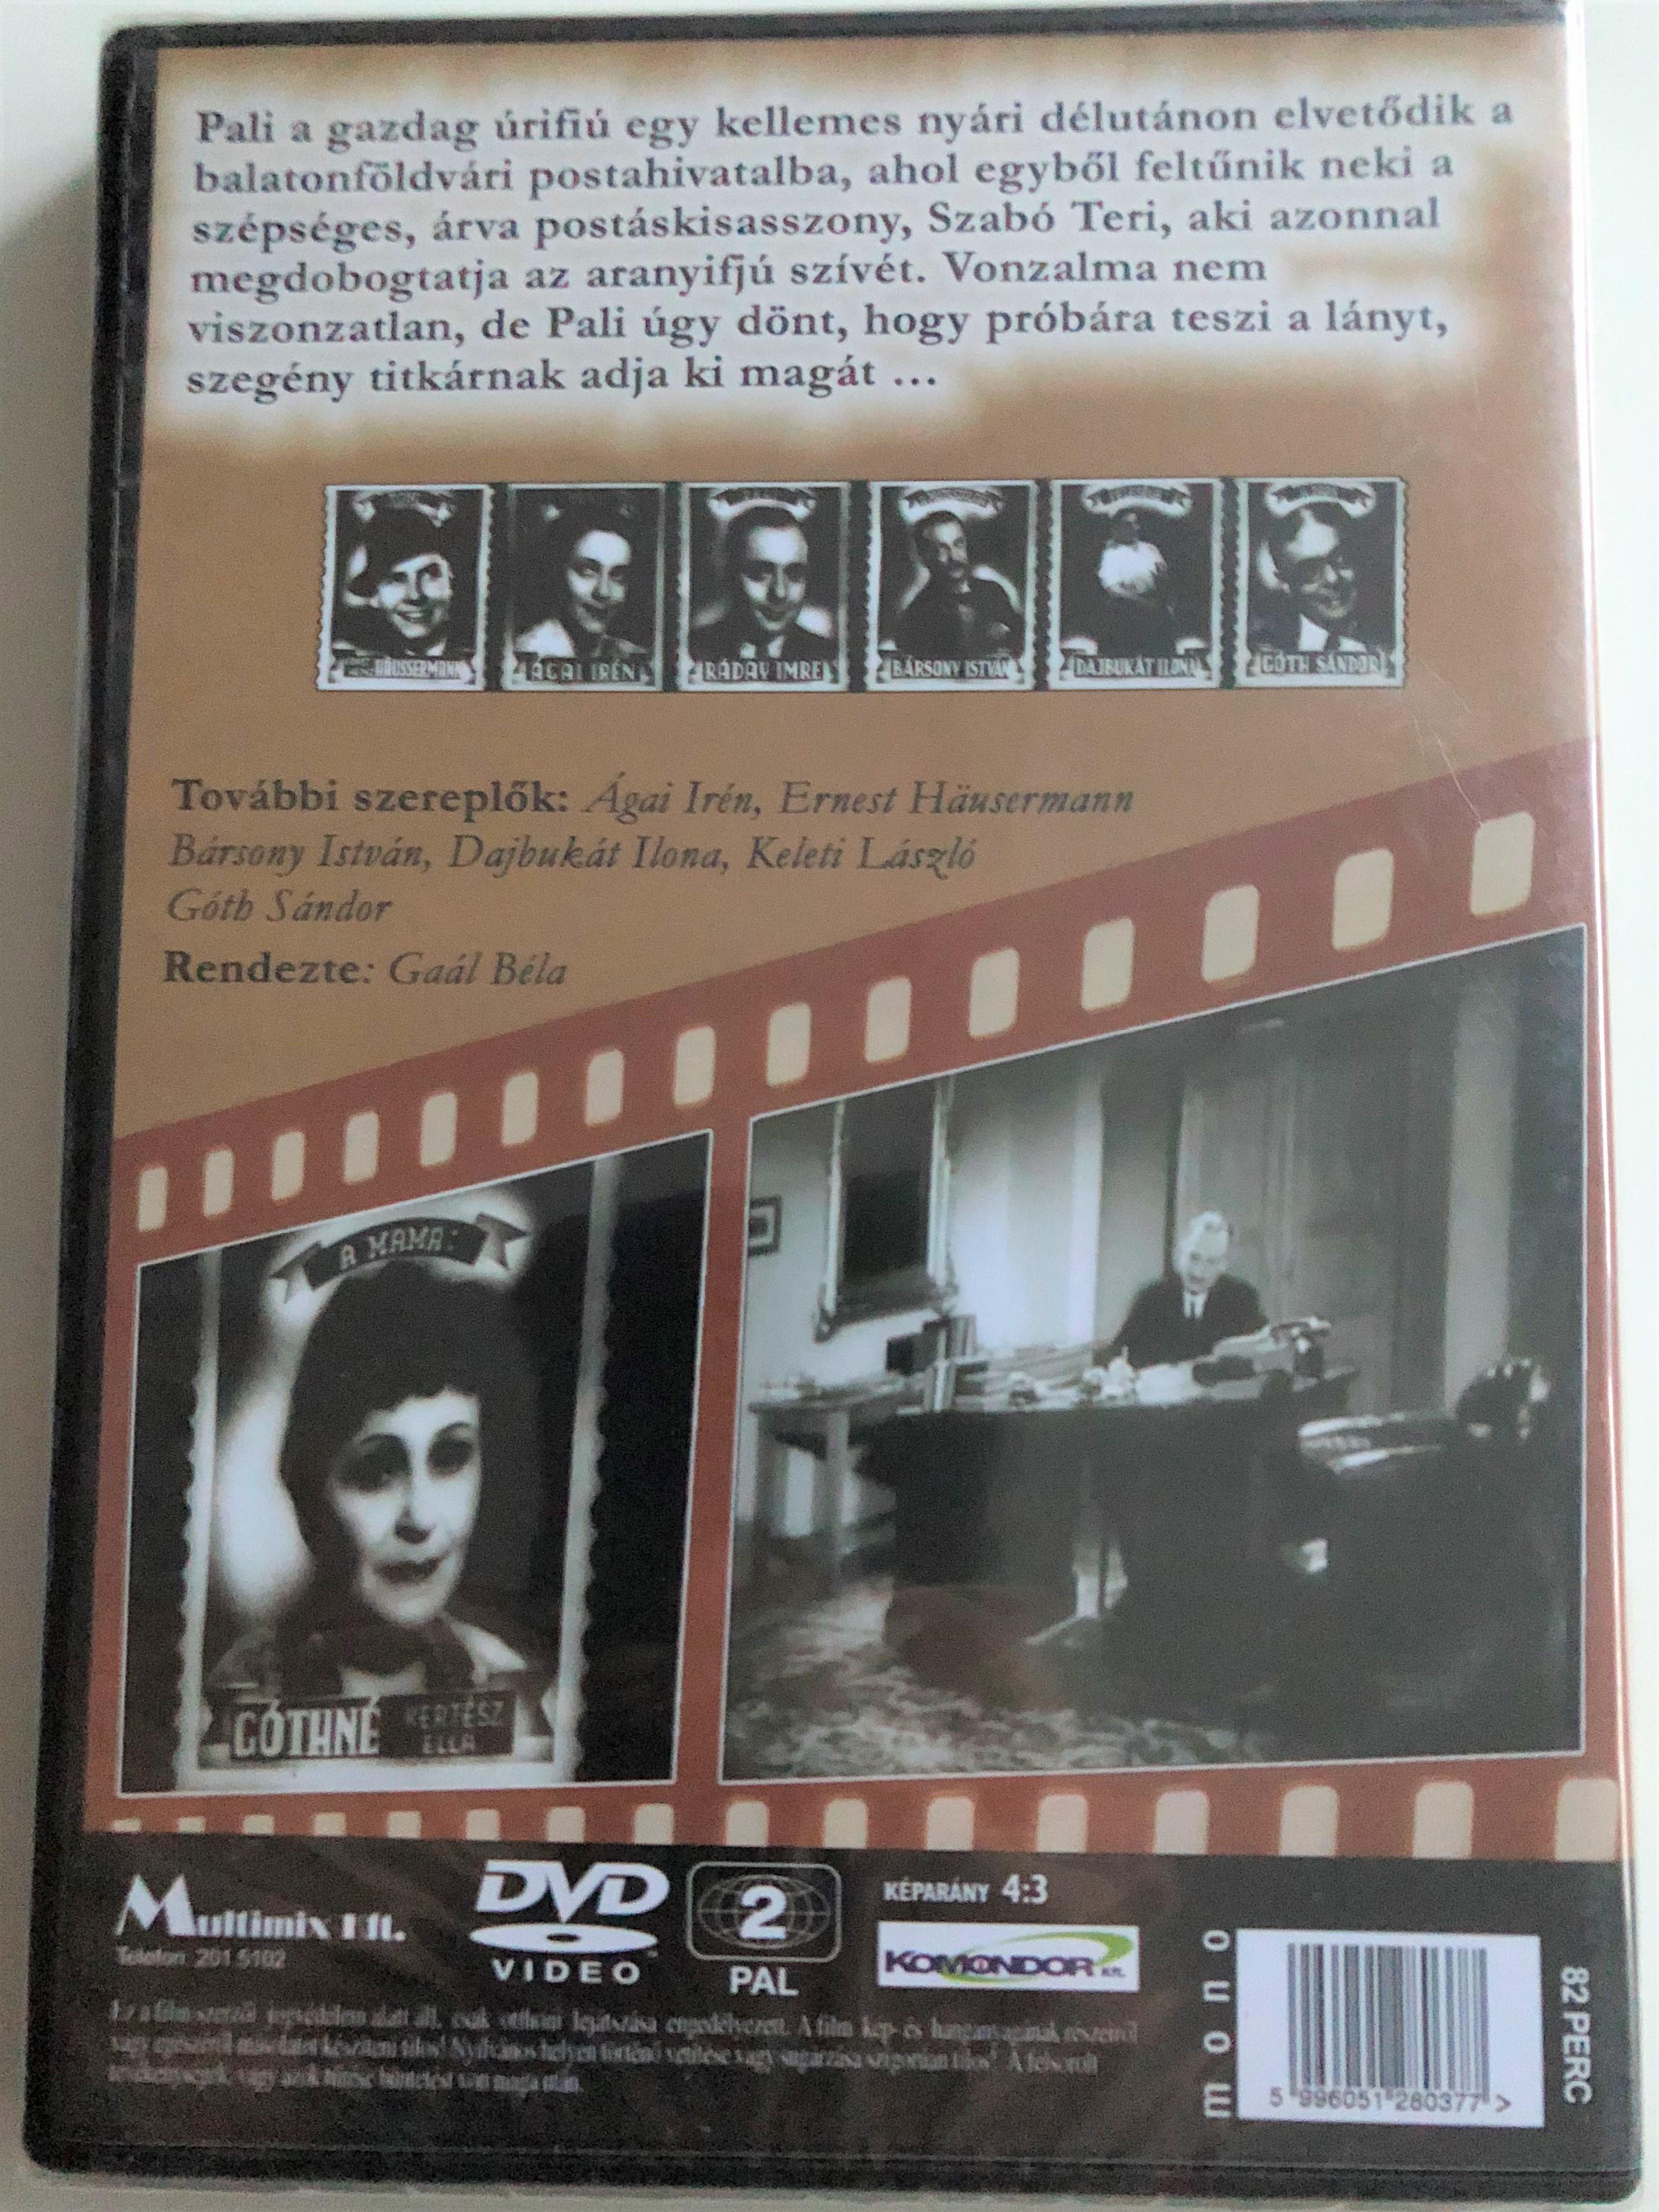 recipient-unknown-dvd-1935-c-mzett-ismeretlen-directed-by-ga-l-b-la-starring-kabos-gyula-r-day-imre-gay-ir-n-hungarian-b-w-classic-2-.jpg